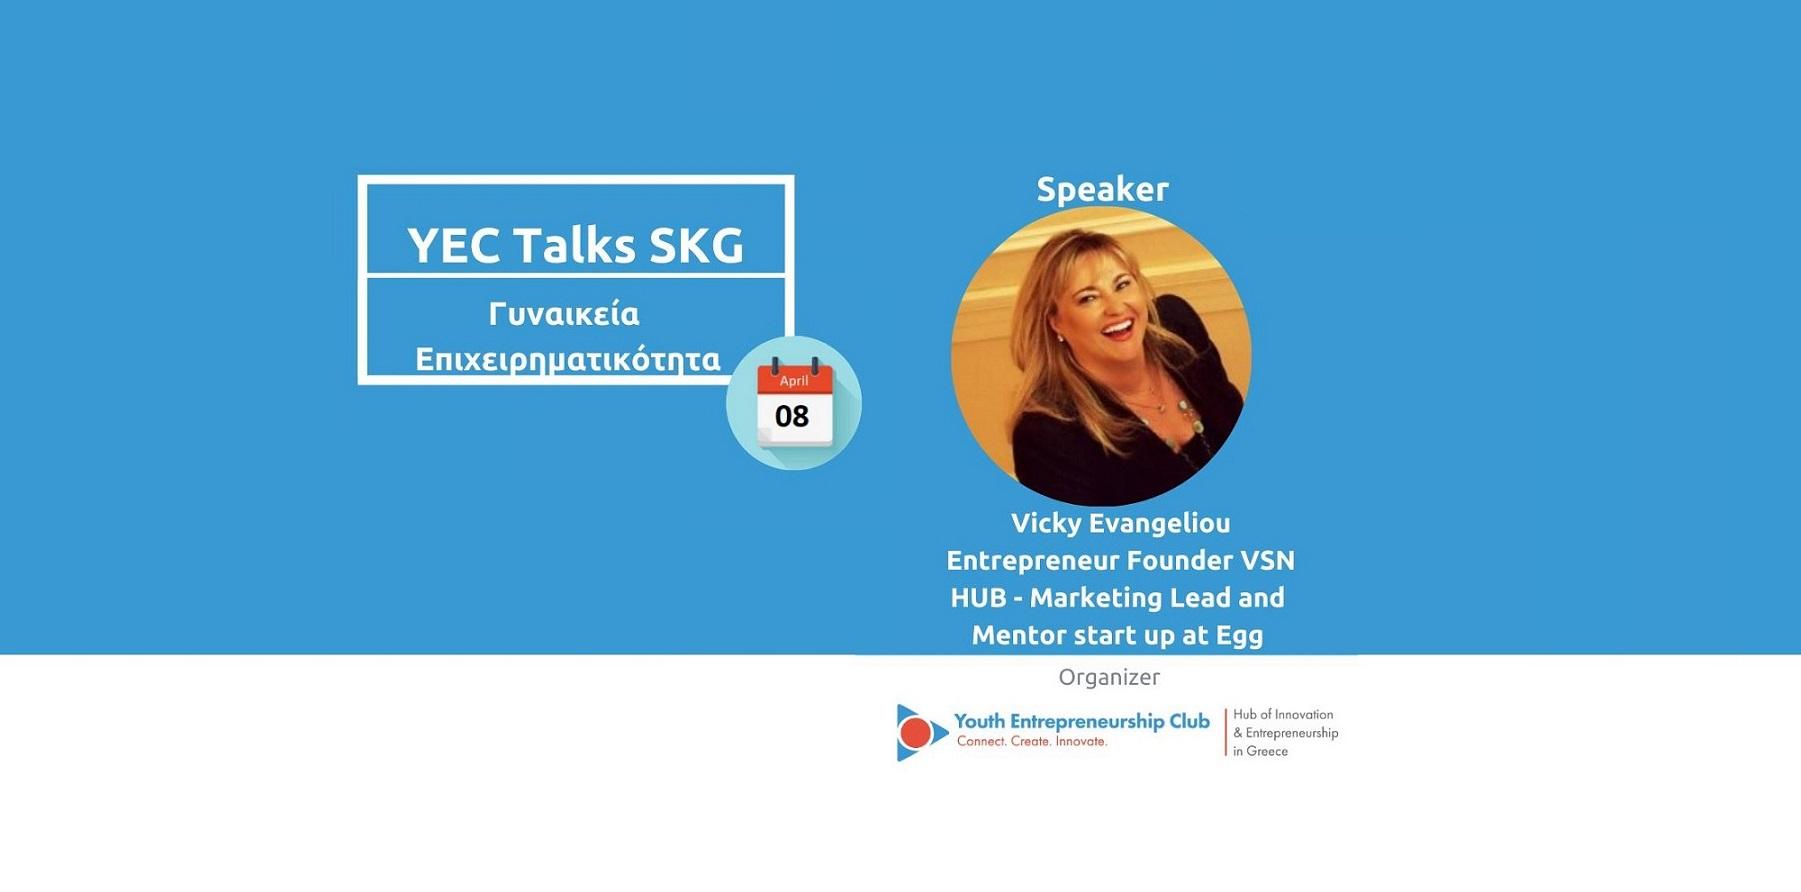 Youth Entrepreneurship Club – Hub of Innovation & Entrepreneurship in Greece